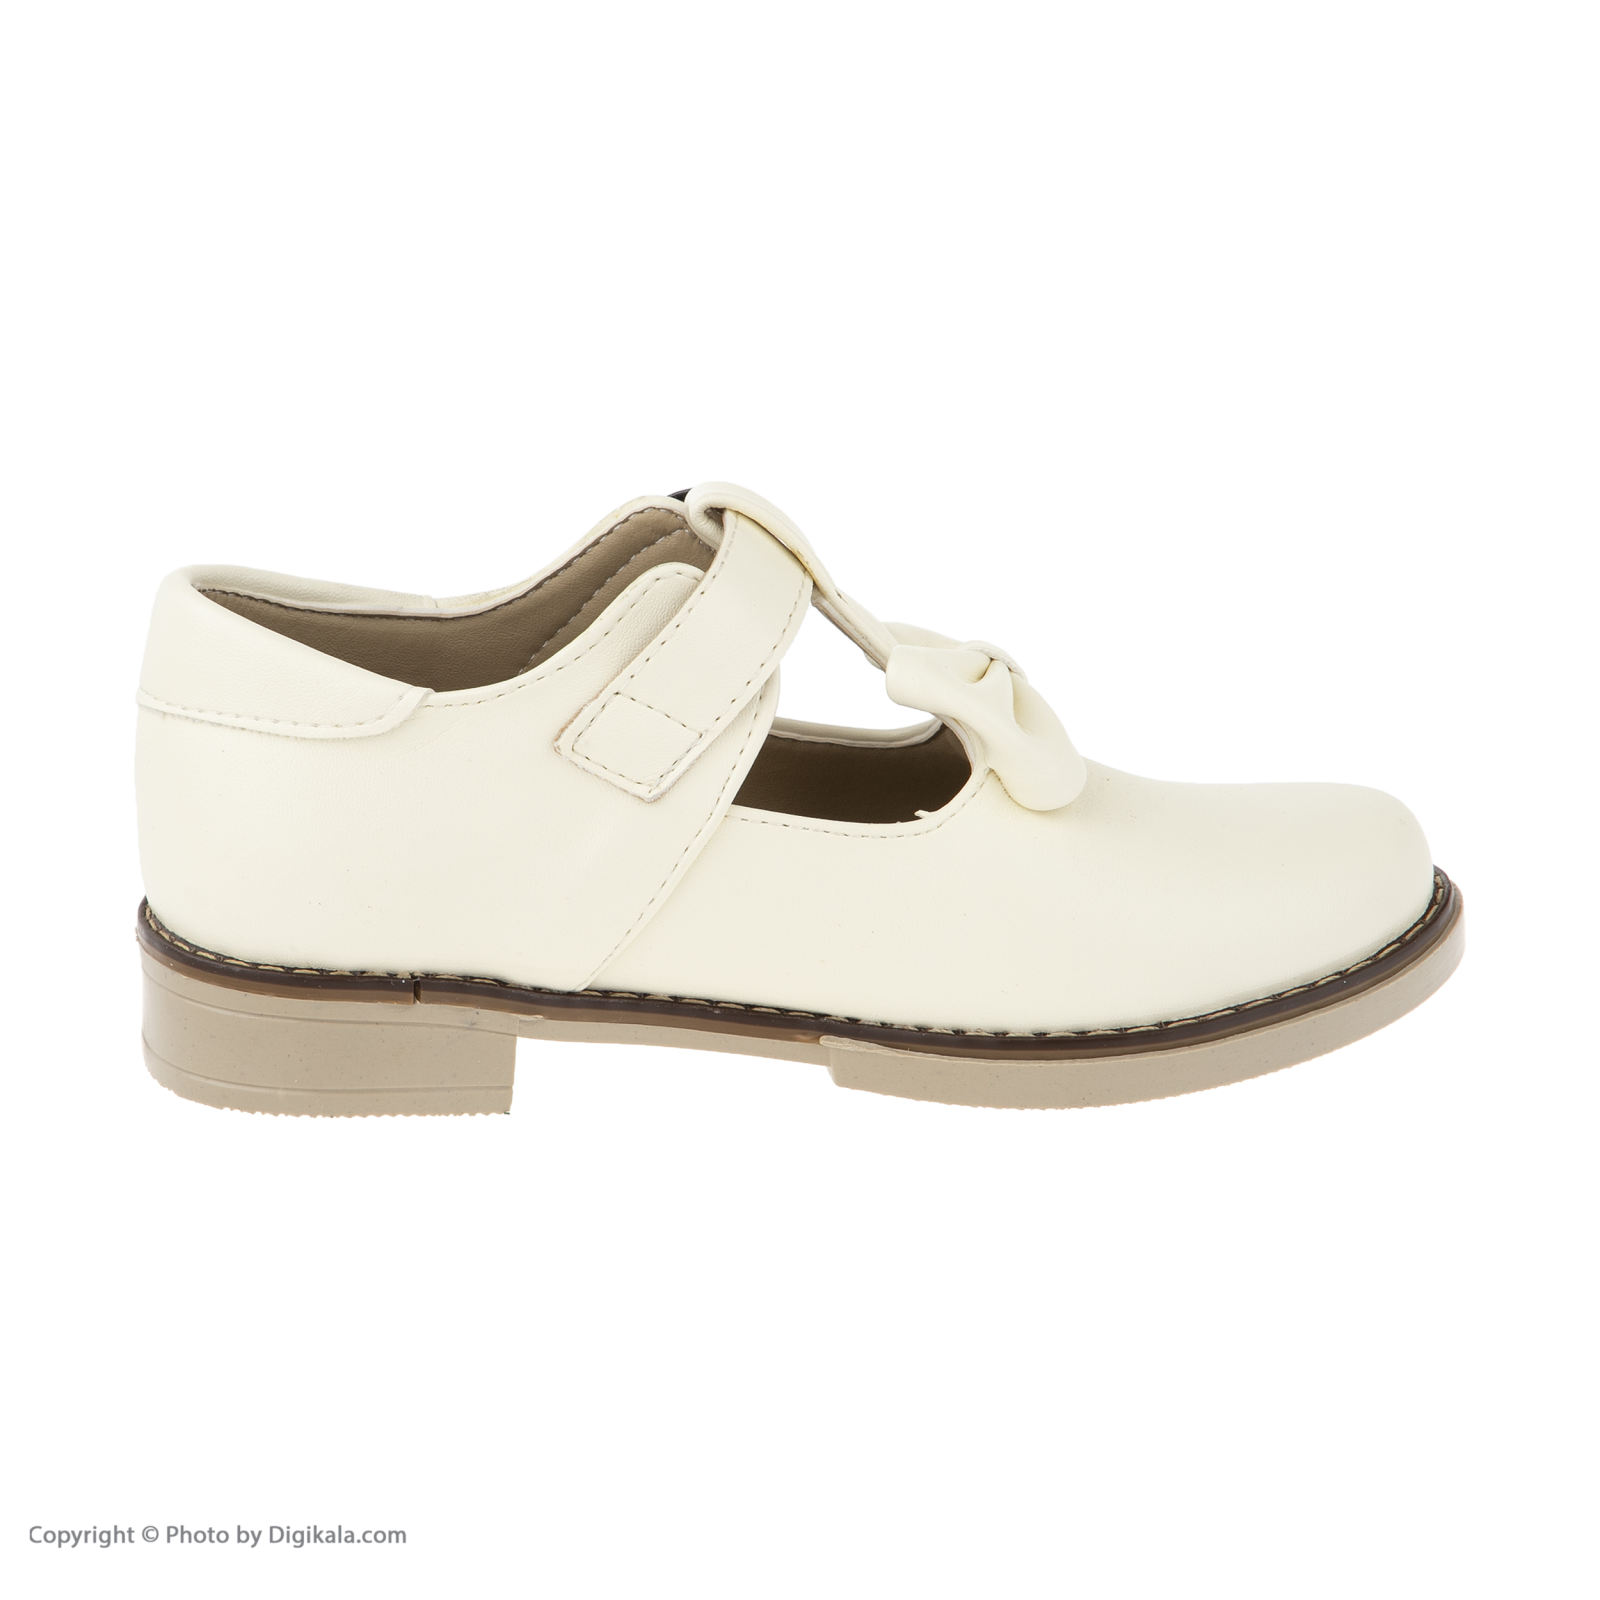 کفش دخترانه کد pa-1034 -  - 3